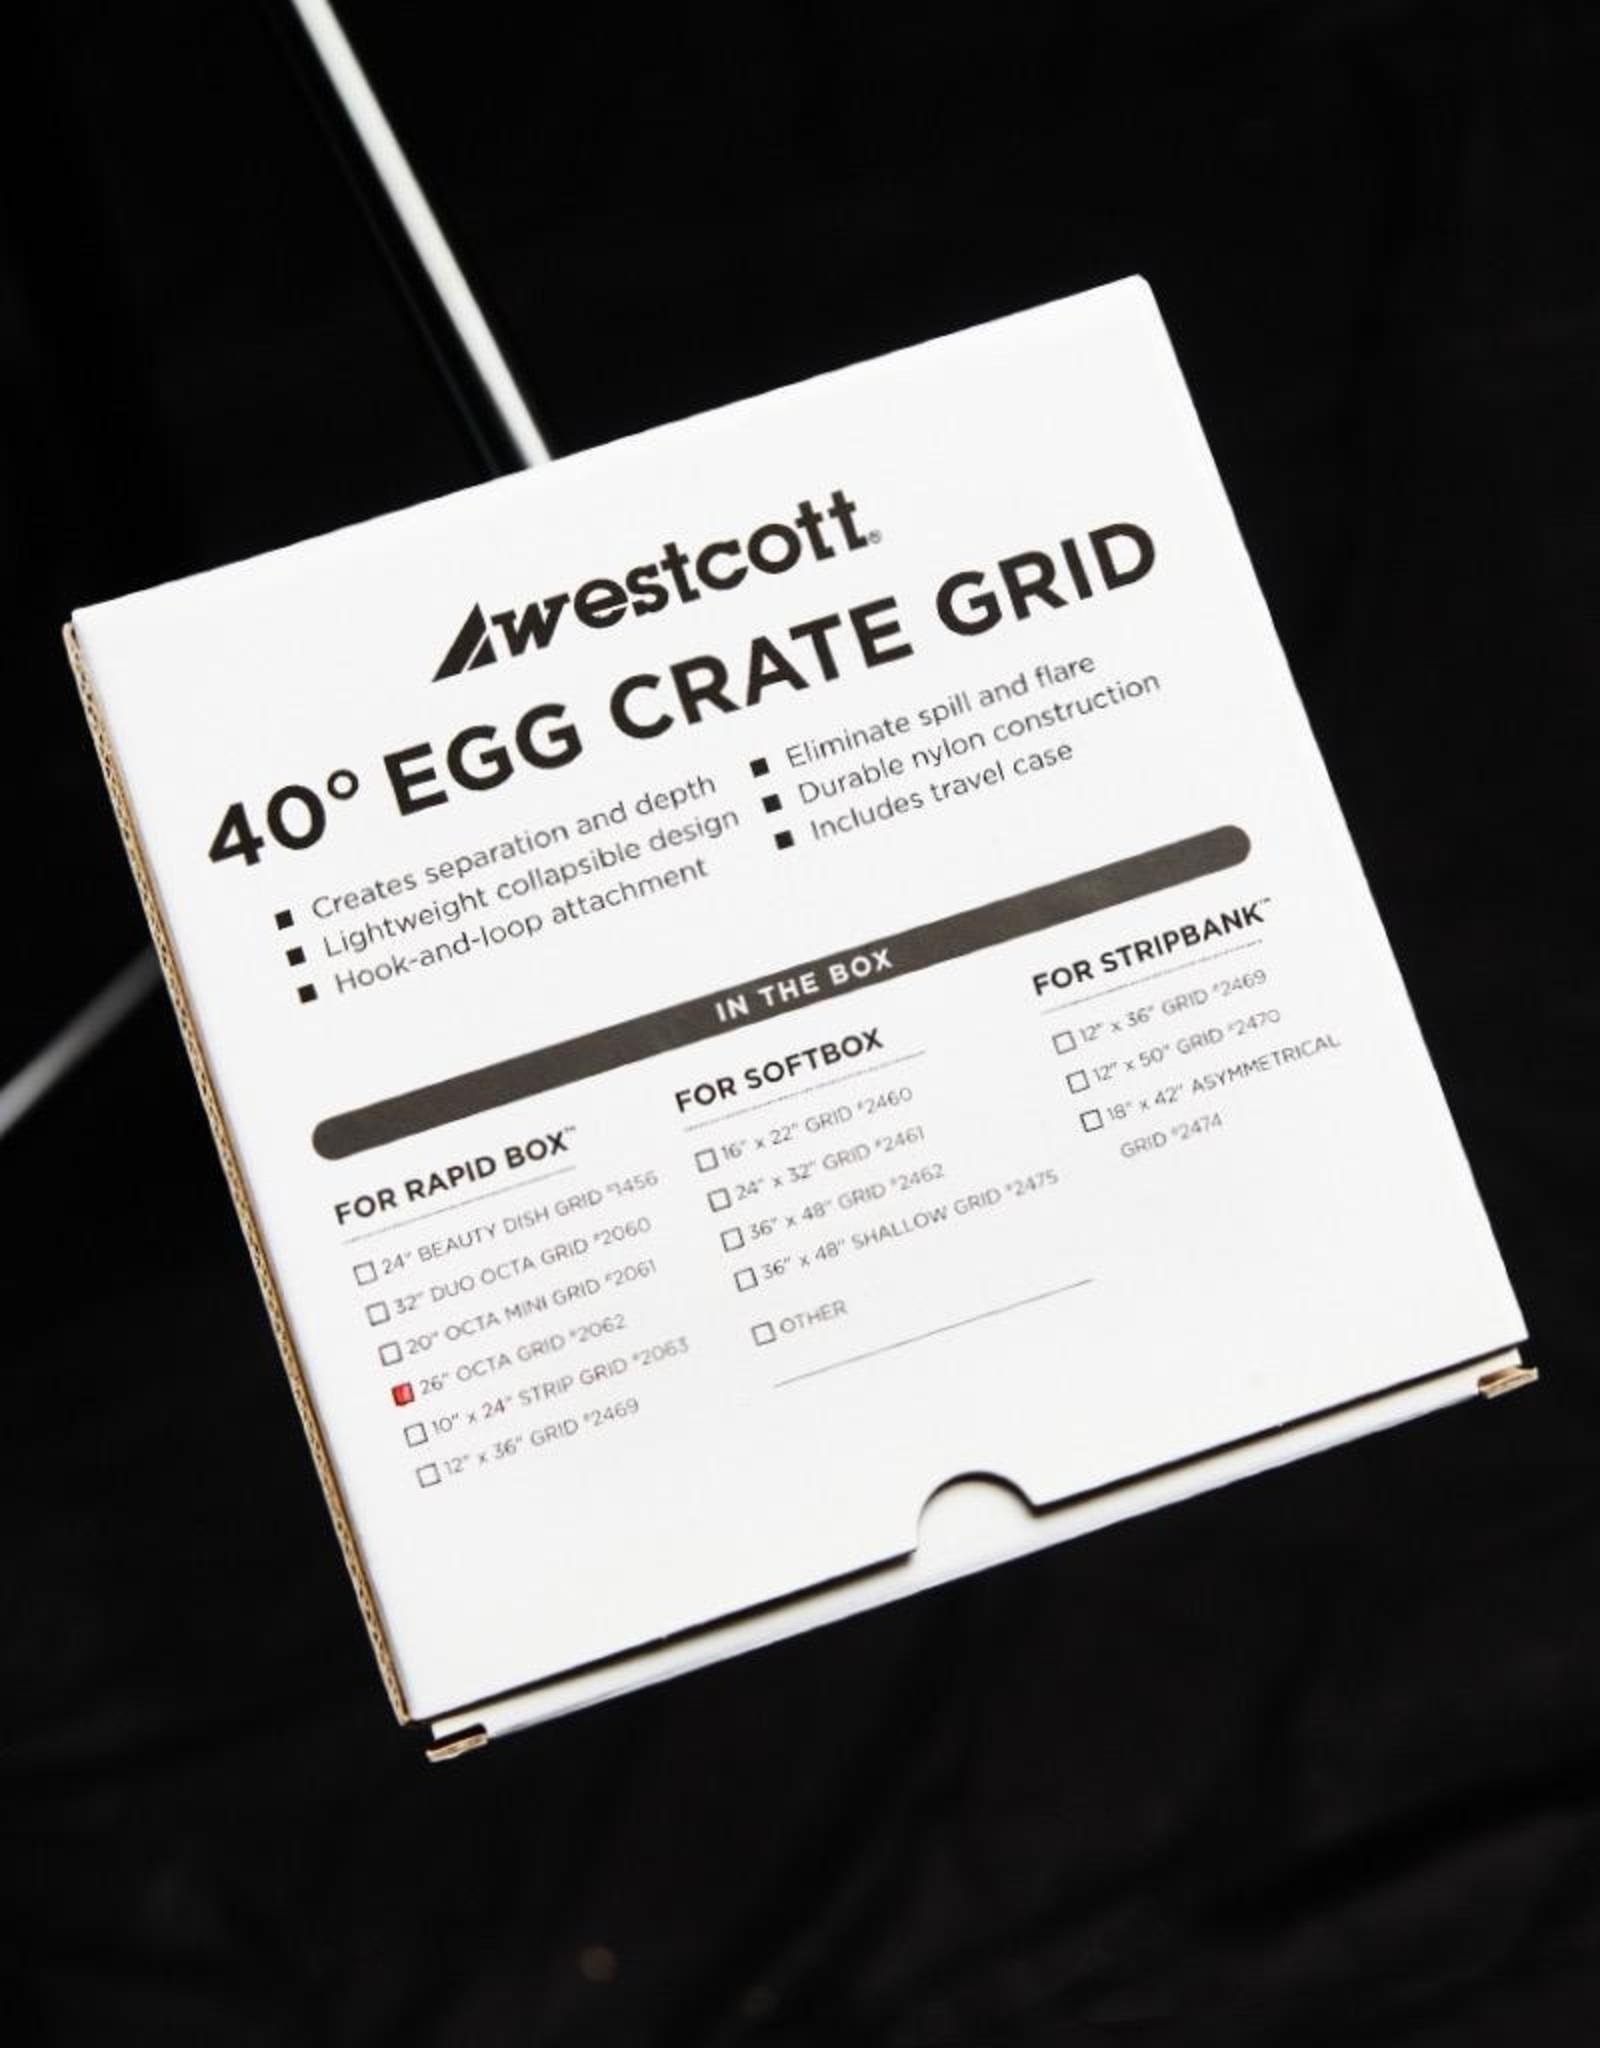 "Westcott Fabric Grid for Rapid Box Octa 26"""